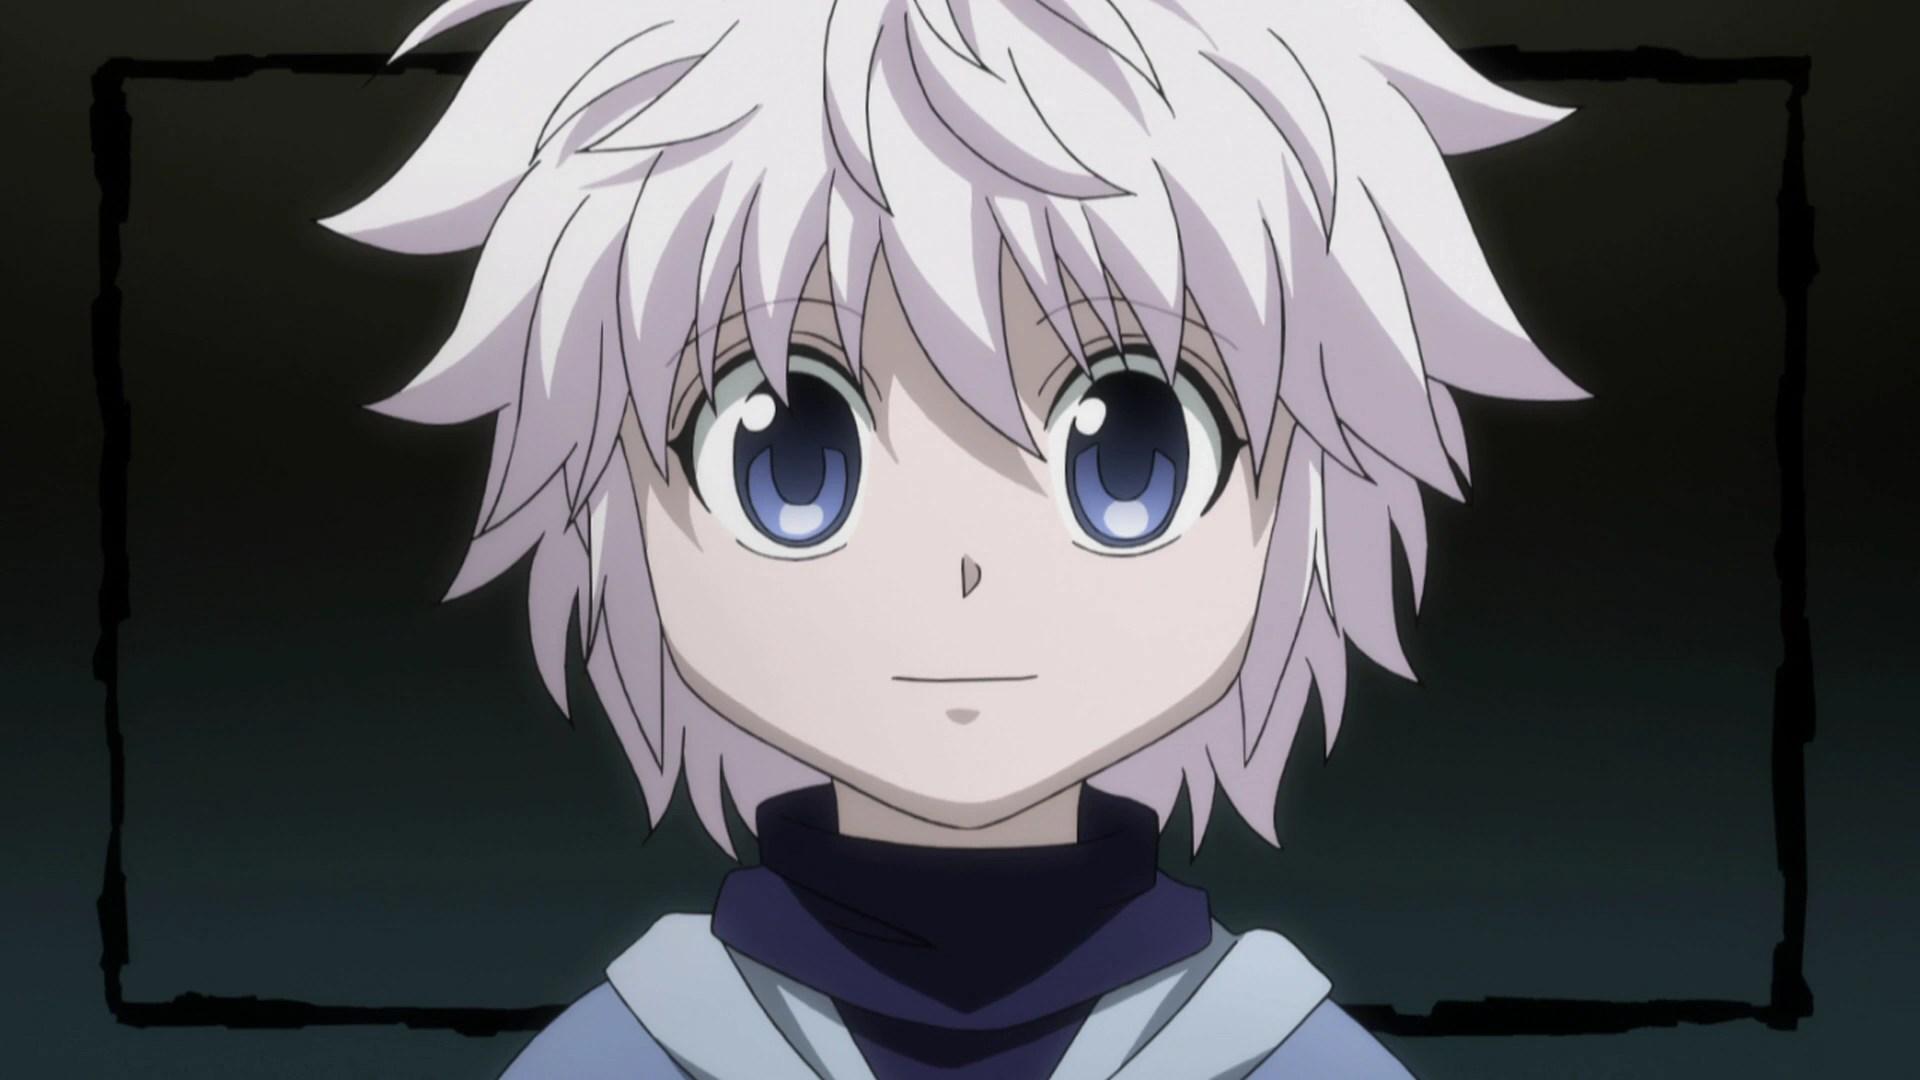 Anime Girl Wallpaper White Haired Demon Guy Yoshihira Naruto Fanon Wiki Fandom Powered By Wikia